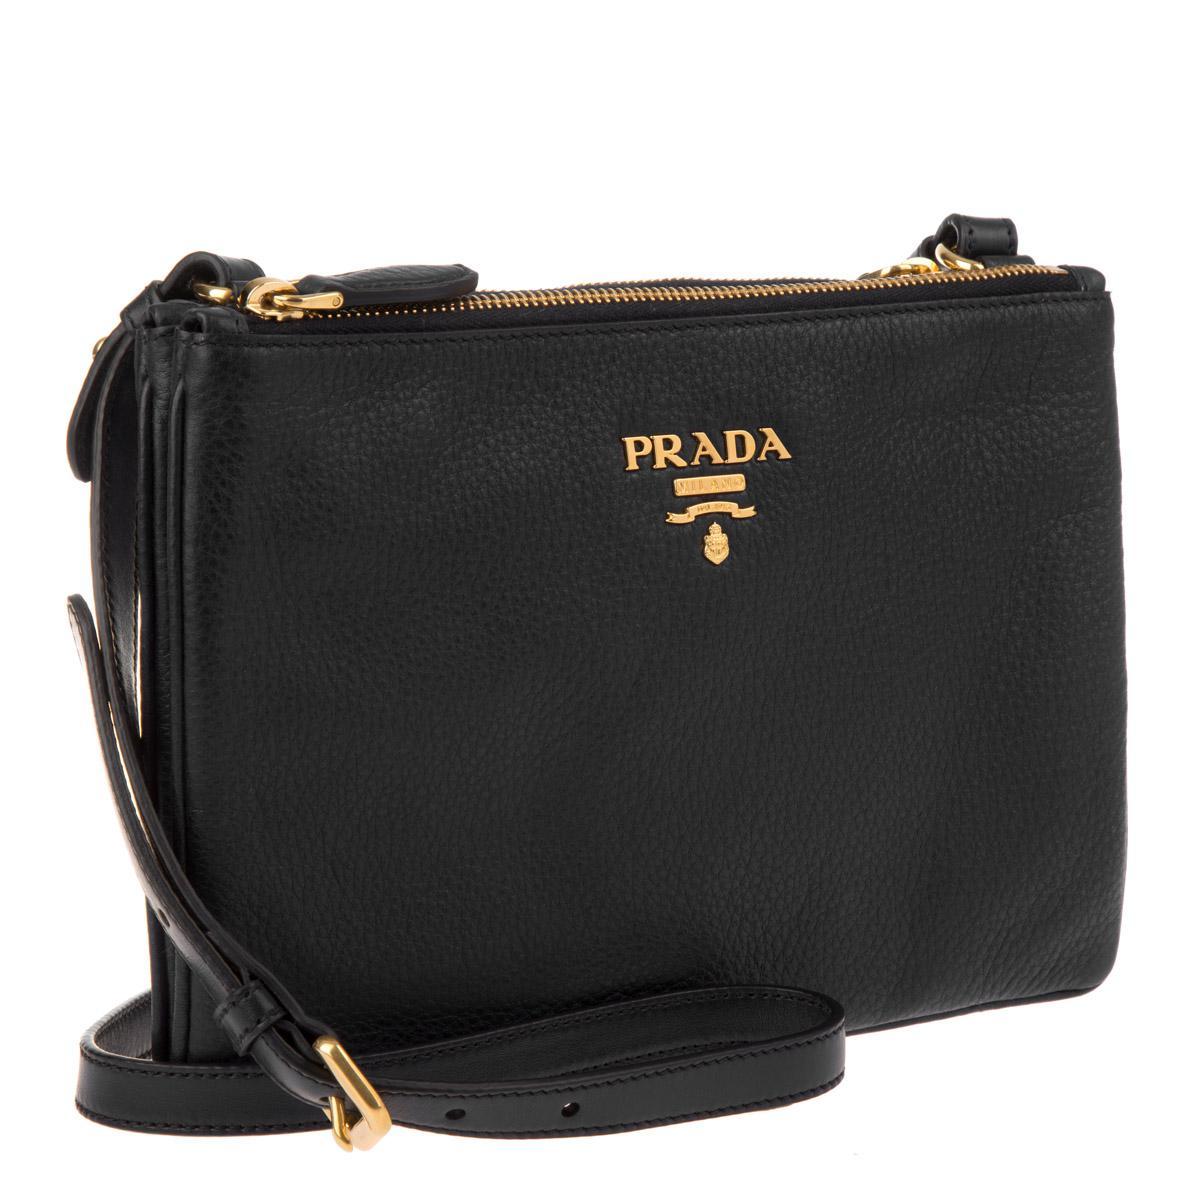 2c8a5a030565 Prada Crossbody Bag Vitello Daino Nero in Black - Lyst